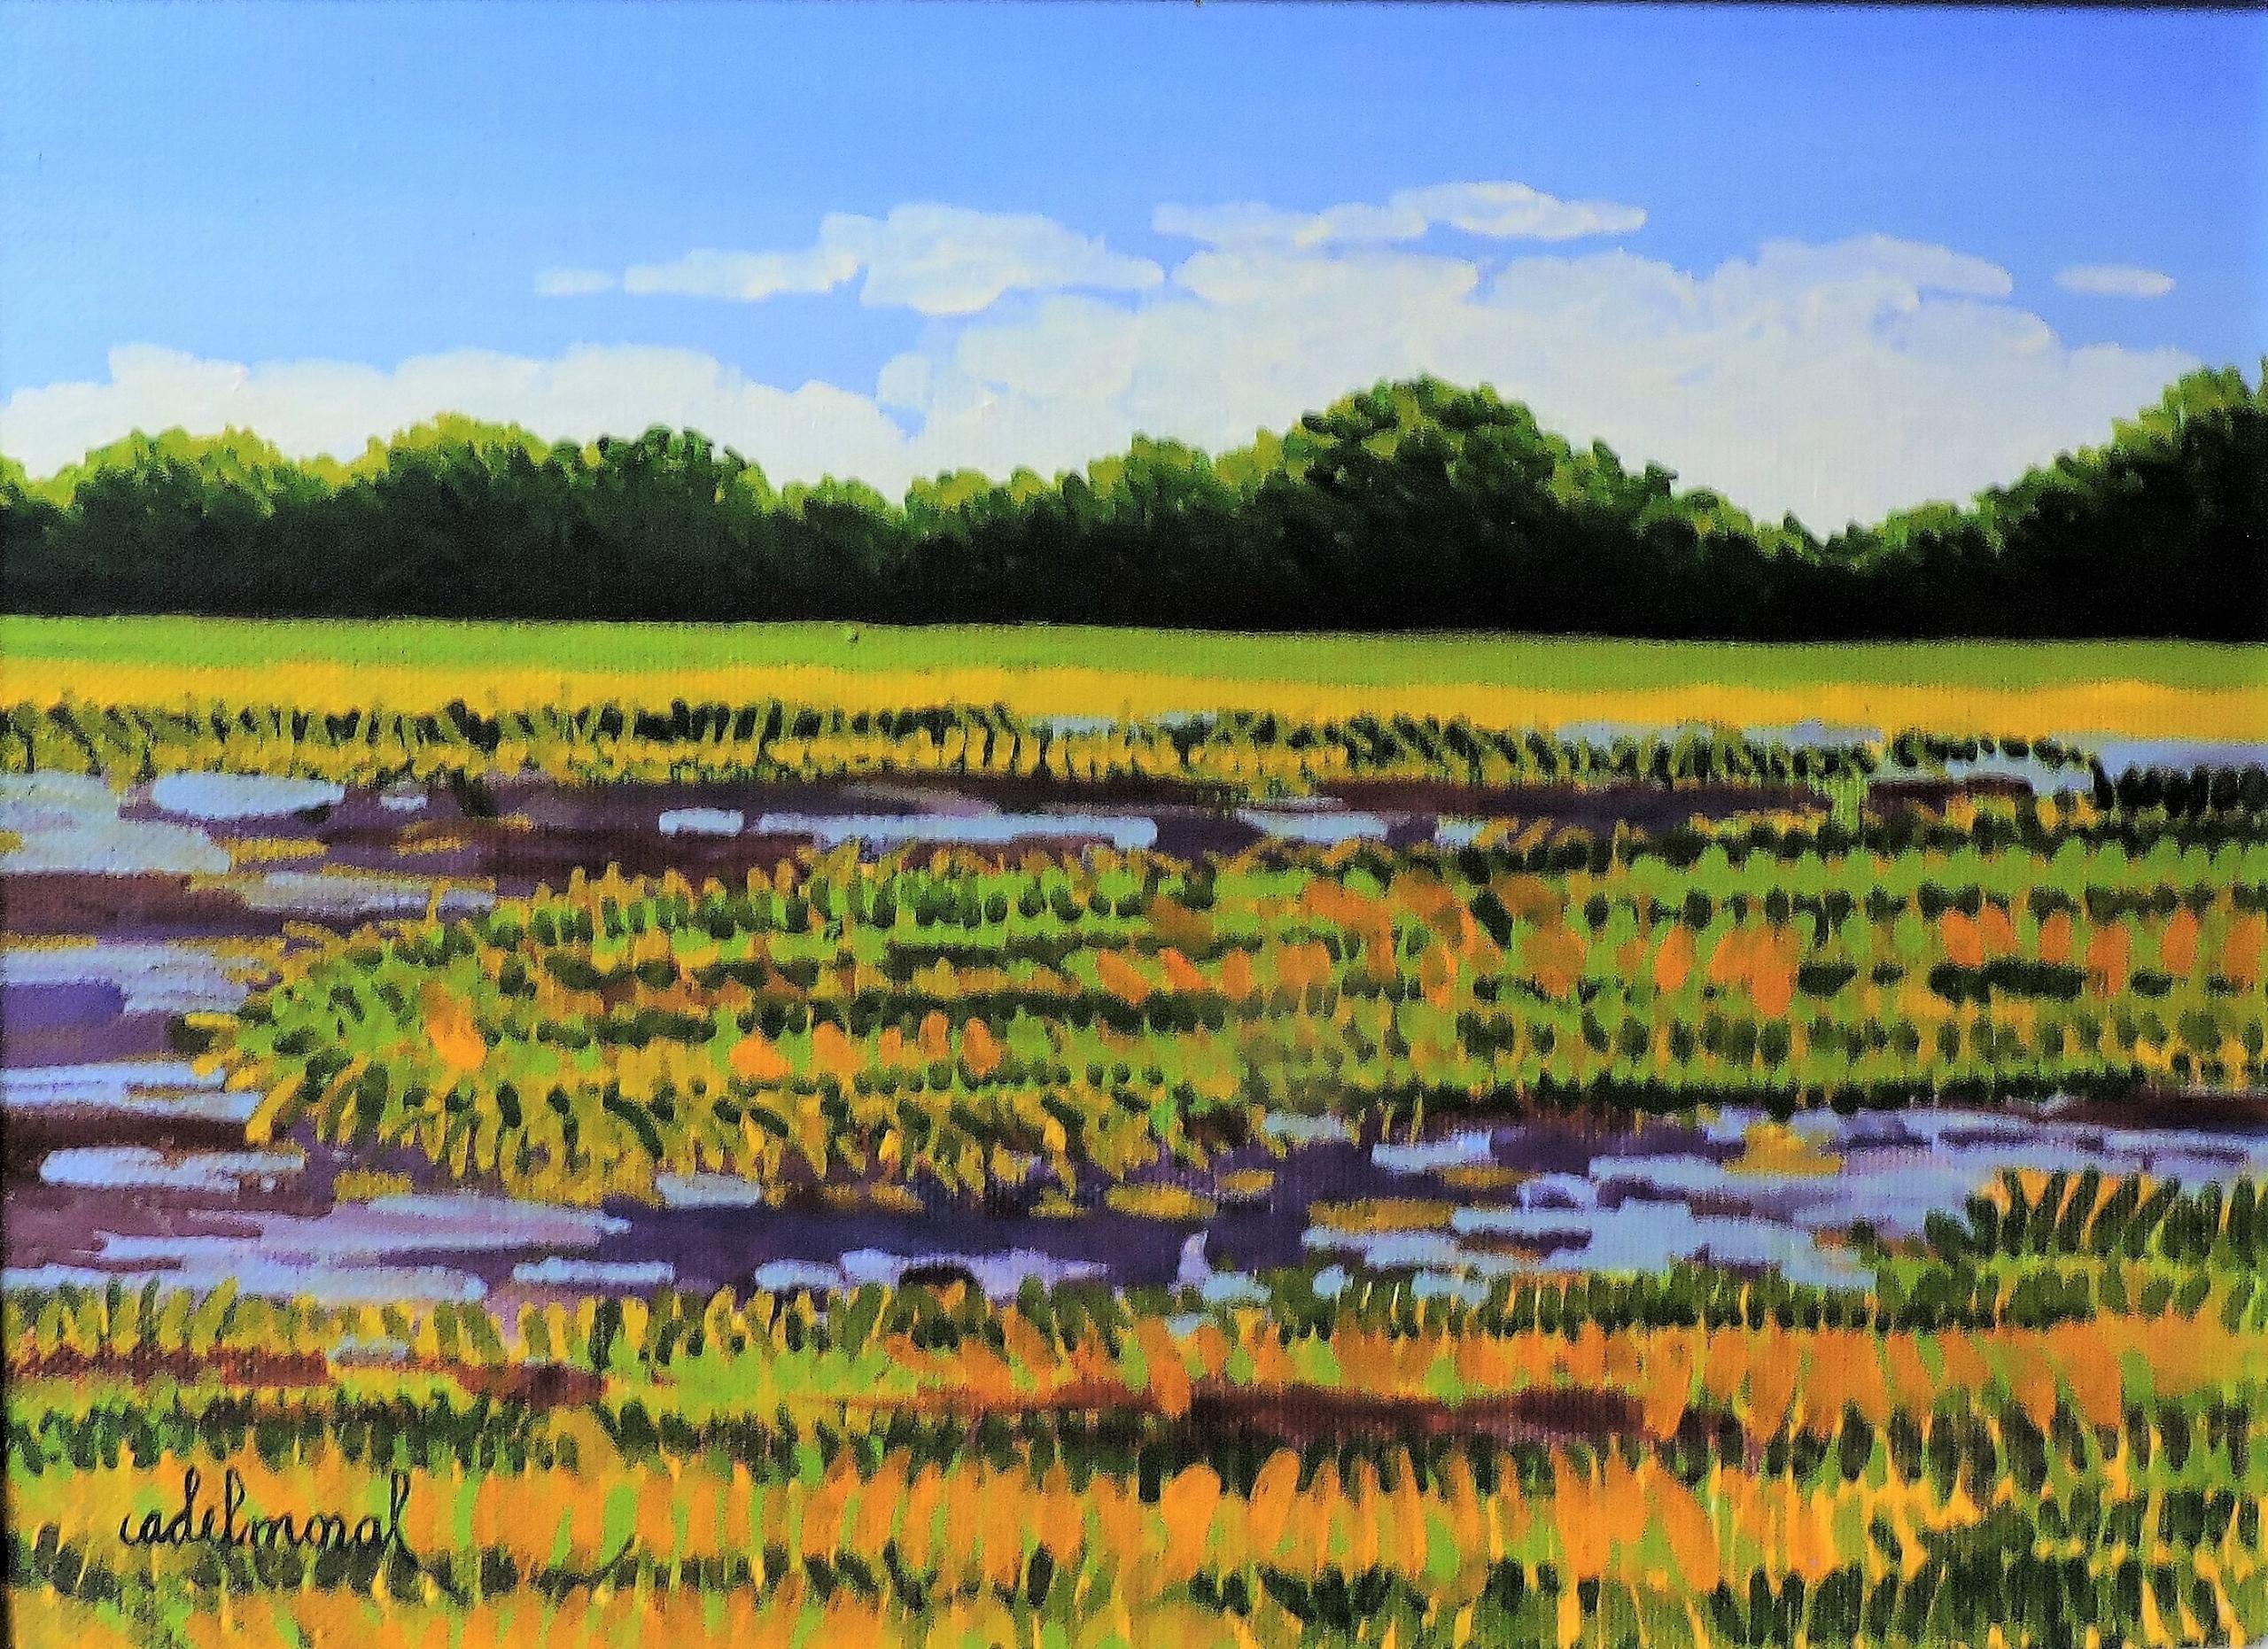 Grassy Field and Stream